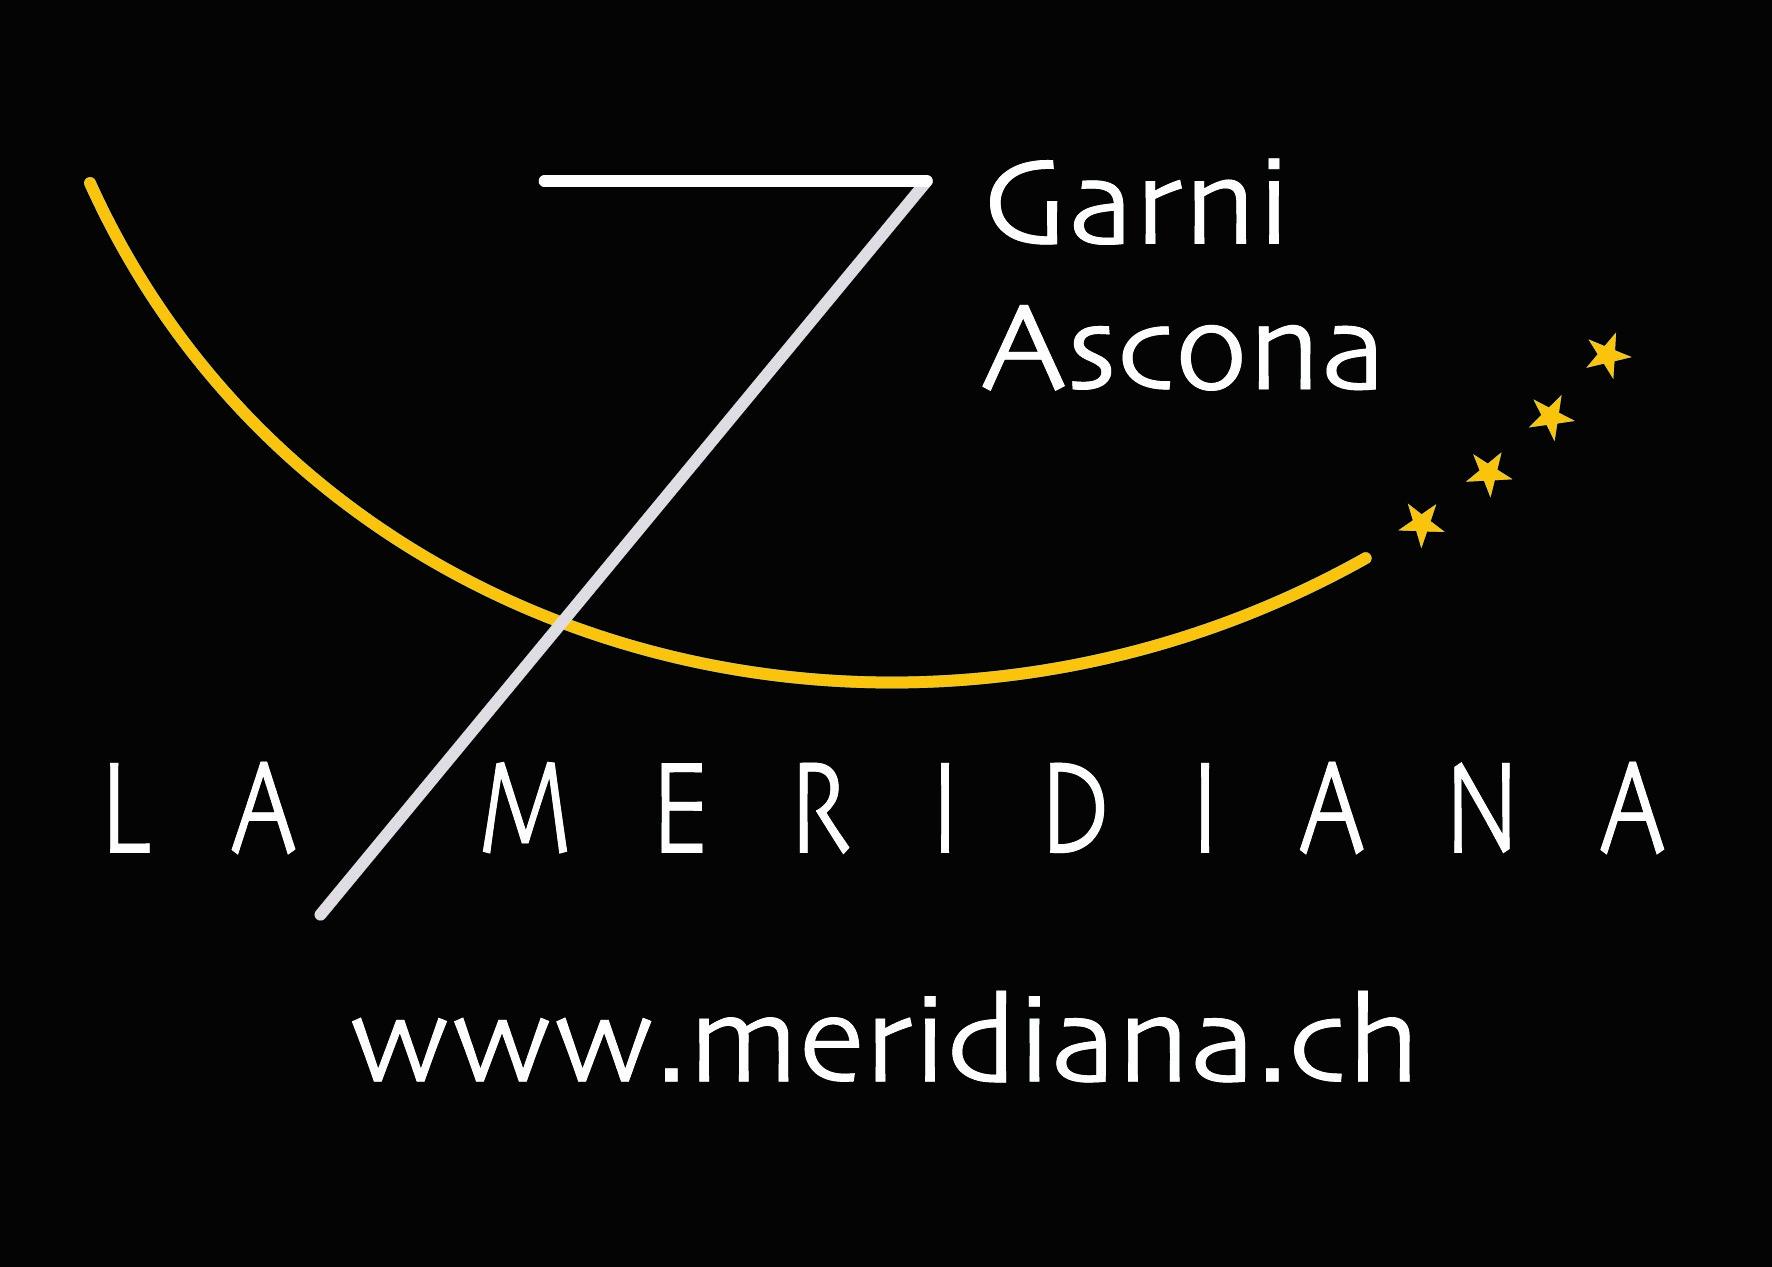 LA MERIDIANA HOTEL GARNI ASCONA